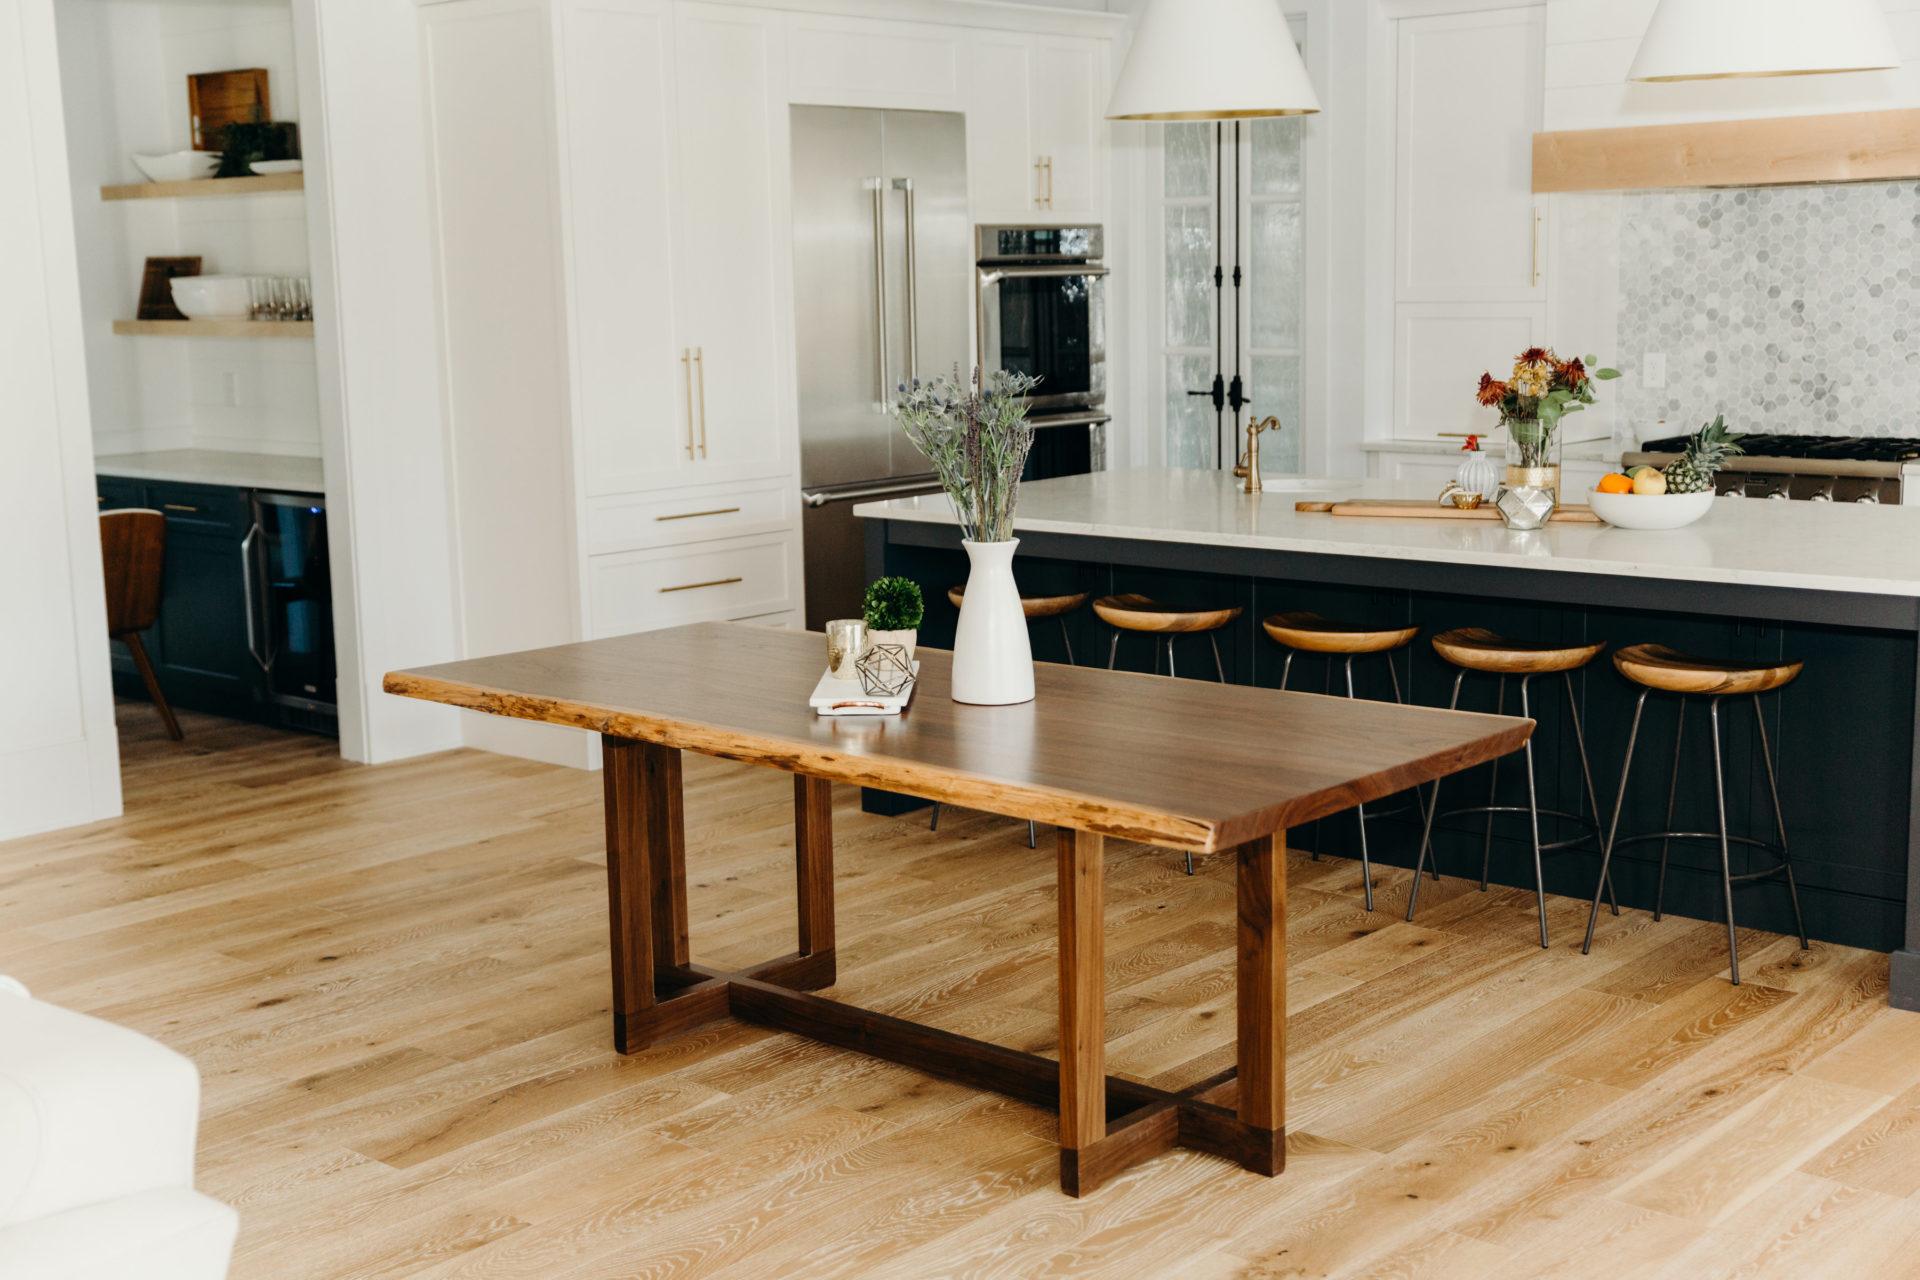 Rustic Trades Furniture Rustic Distressed Reclaimed Dining Kitchen Farm Tables Atlanta Denver